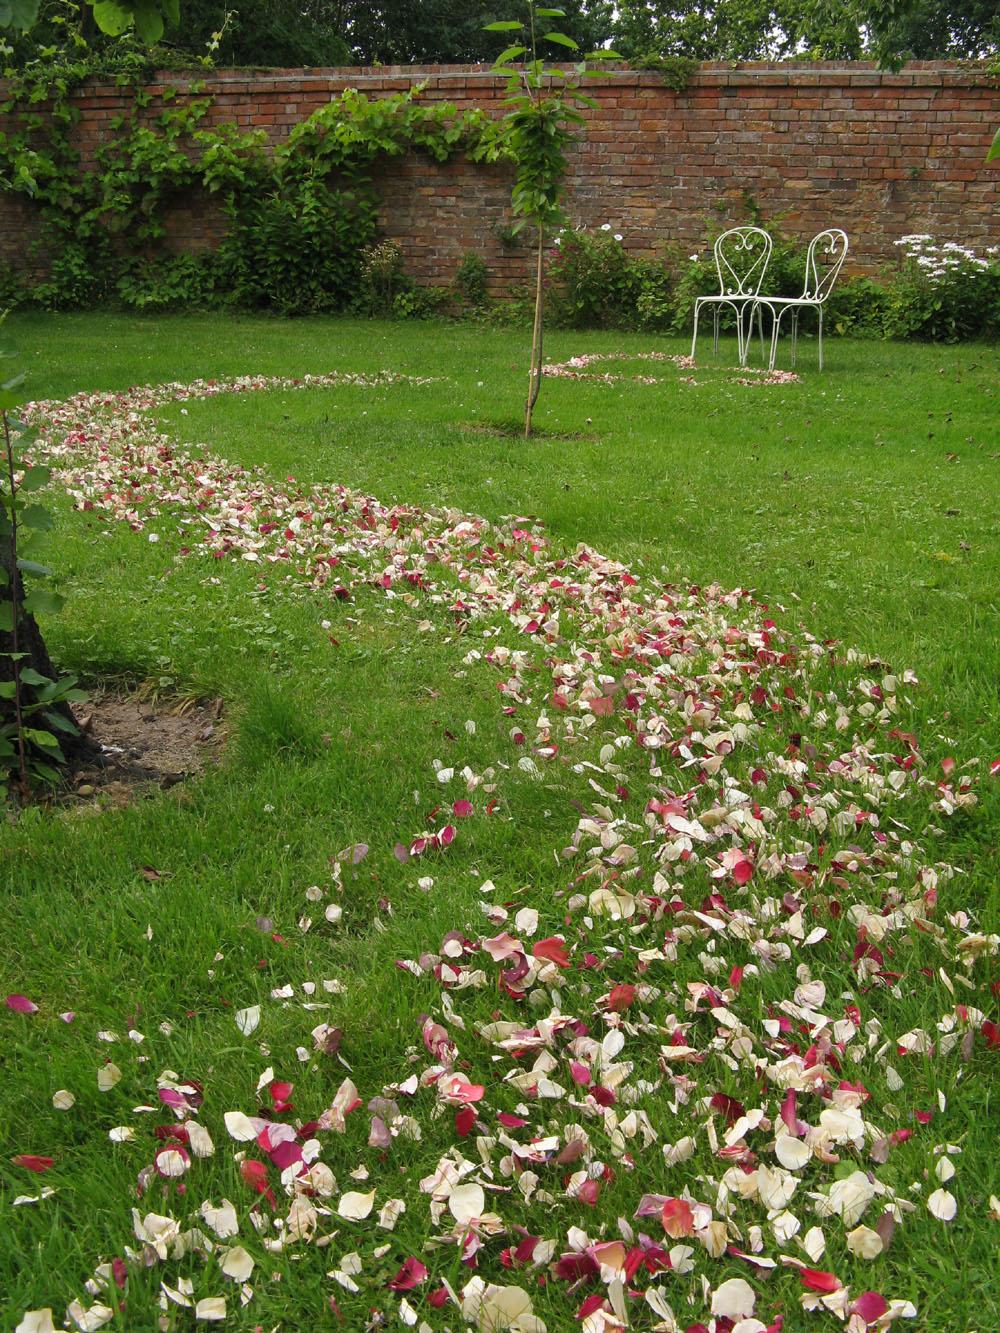 Flower petals - wedding aisles and petal pathways: Rose petal pathway on grass